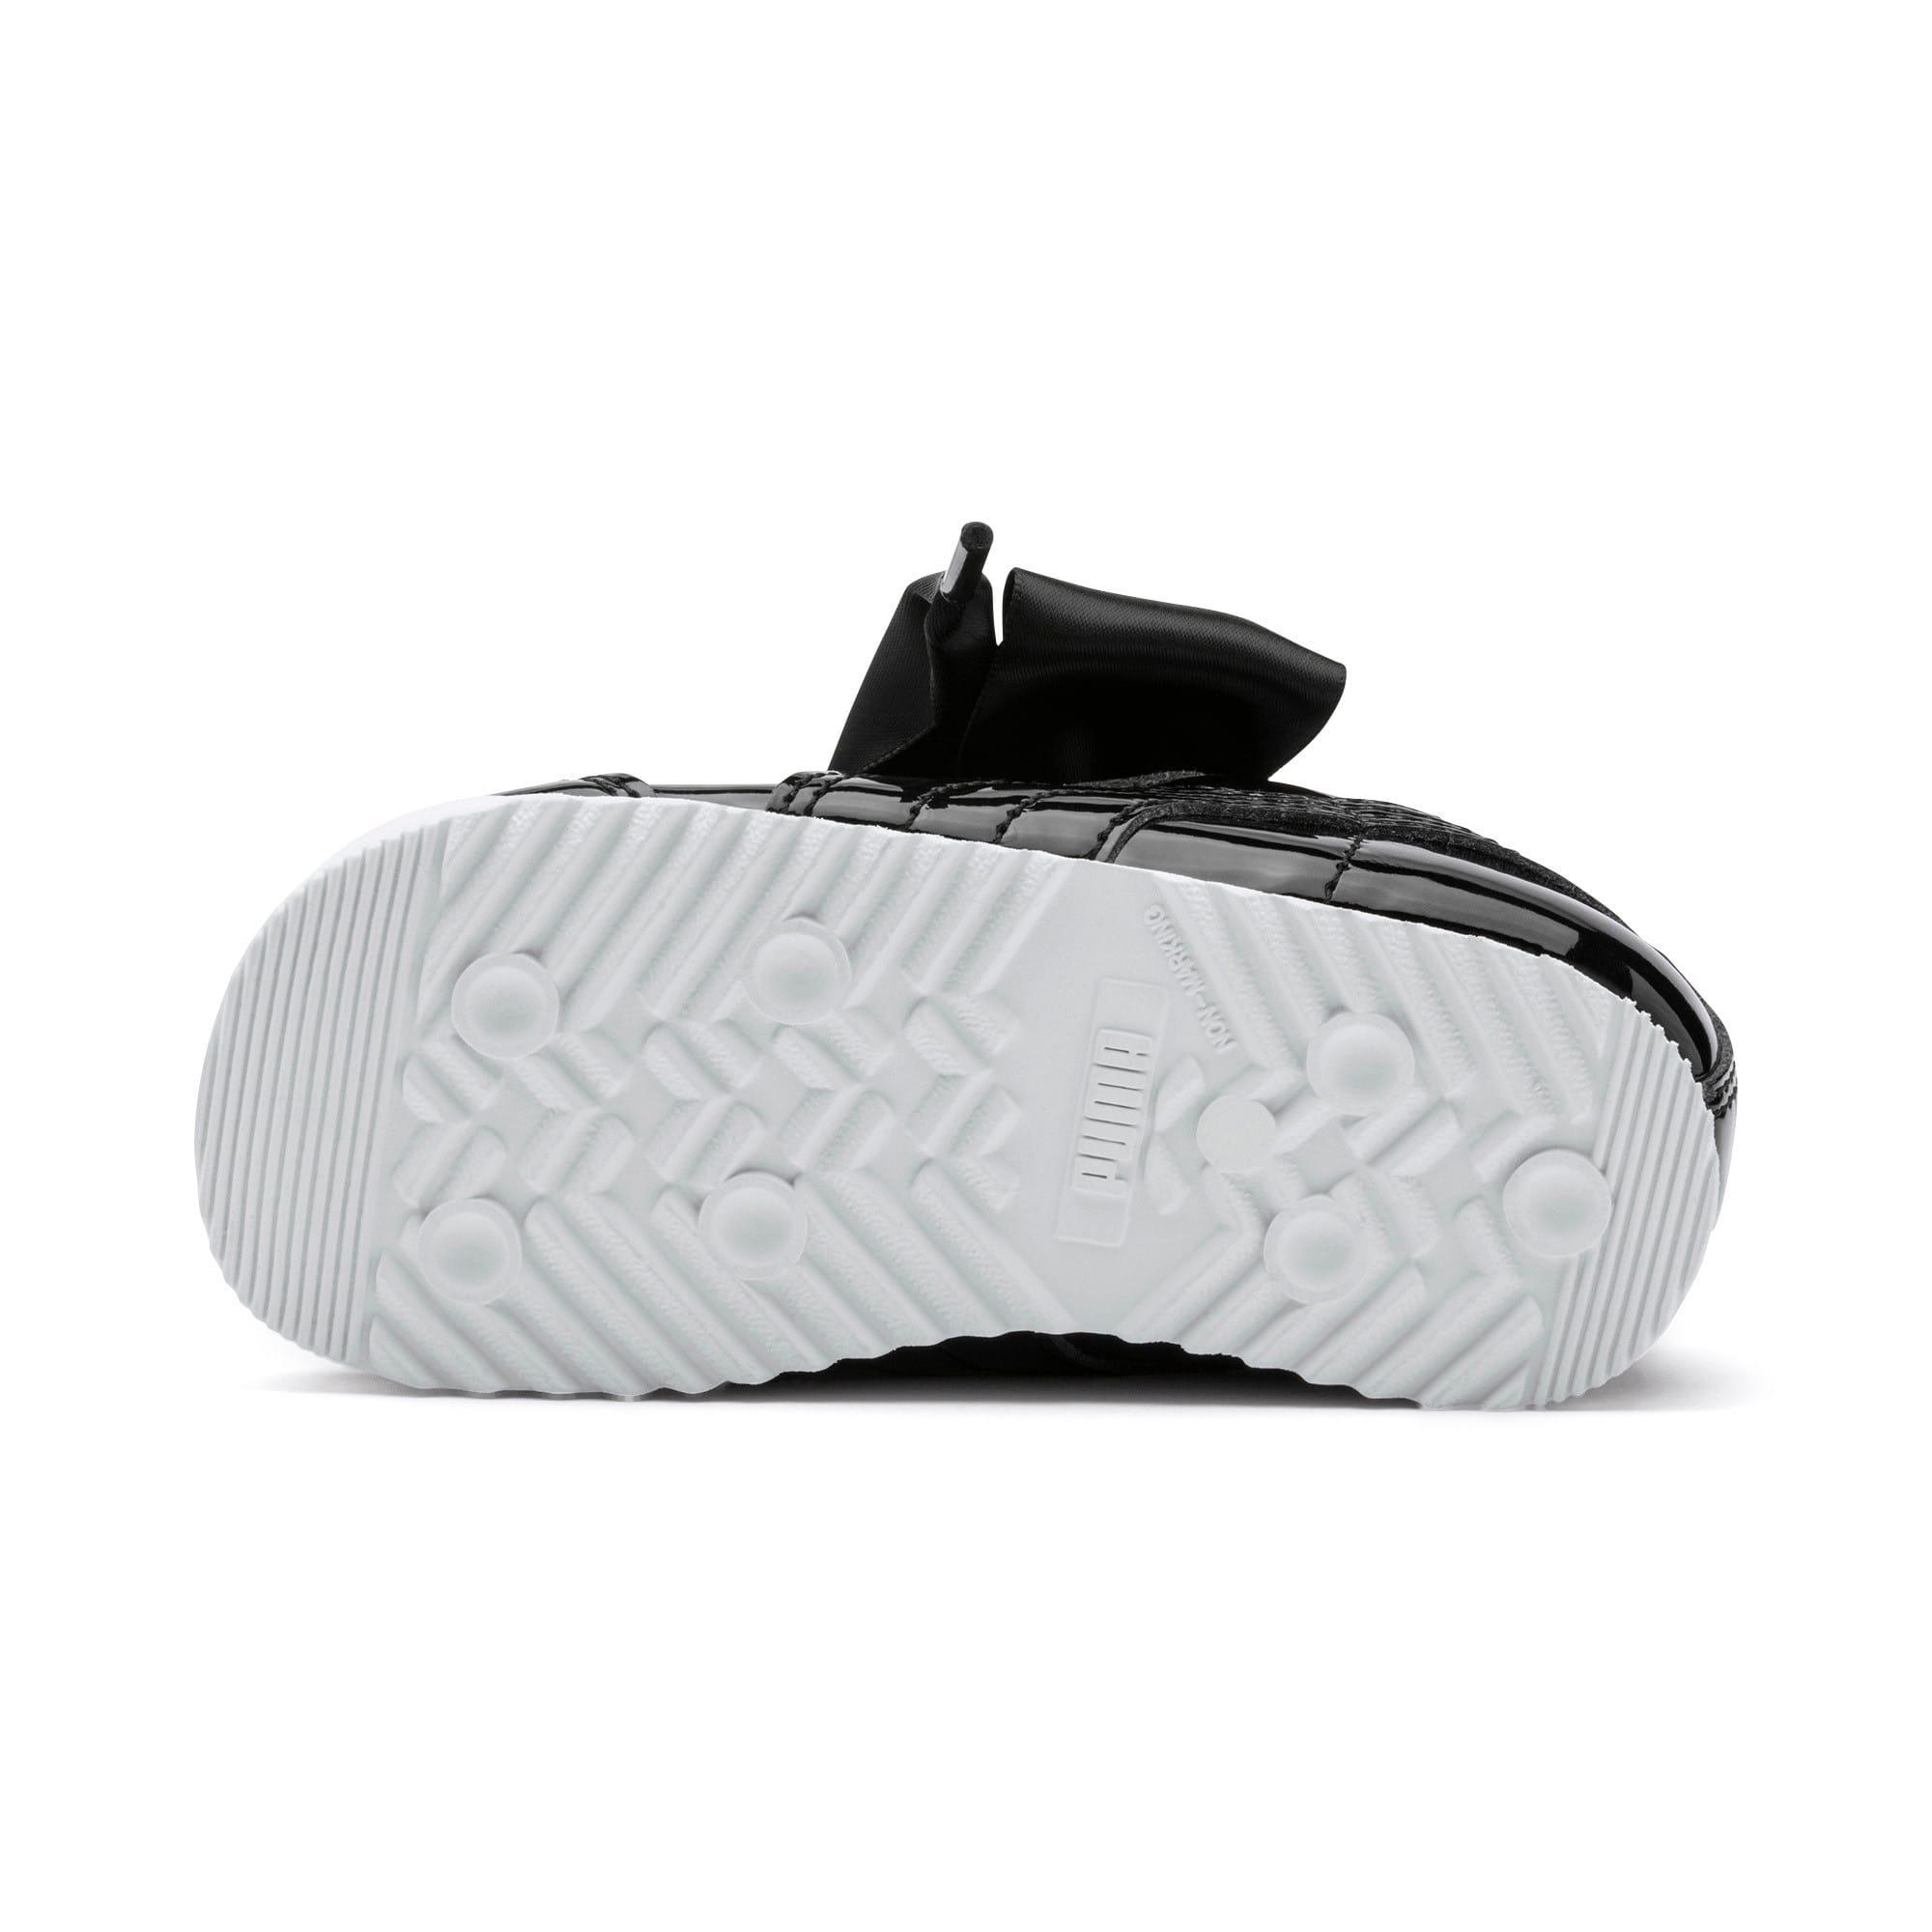 Thumbnail 4 of Roma Heart Patent Toddler Shoes, Puma Black, medium